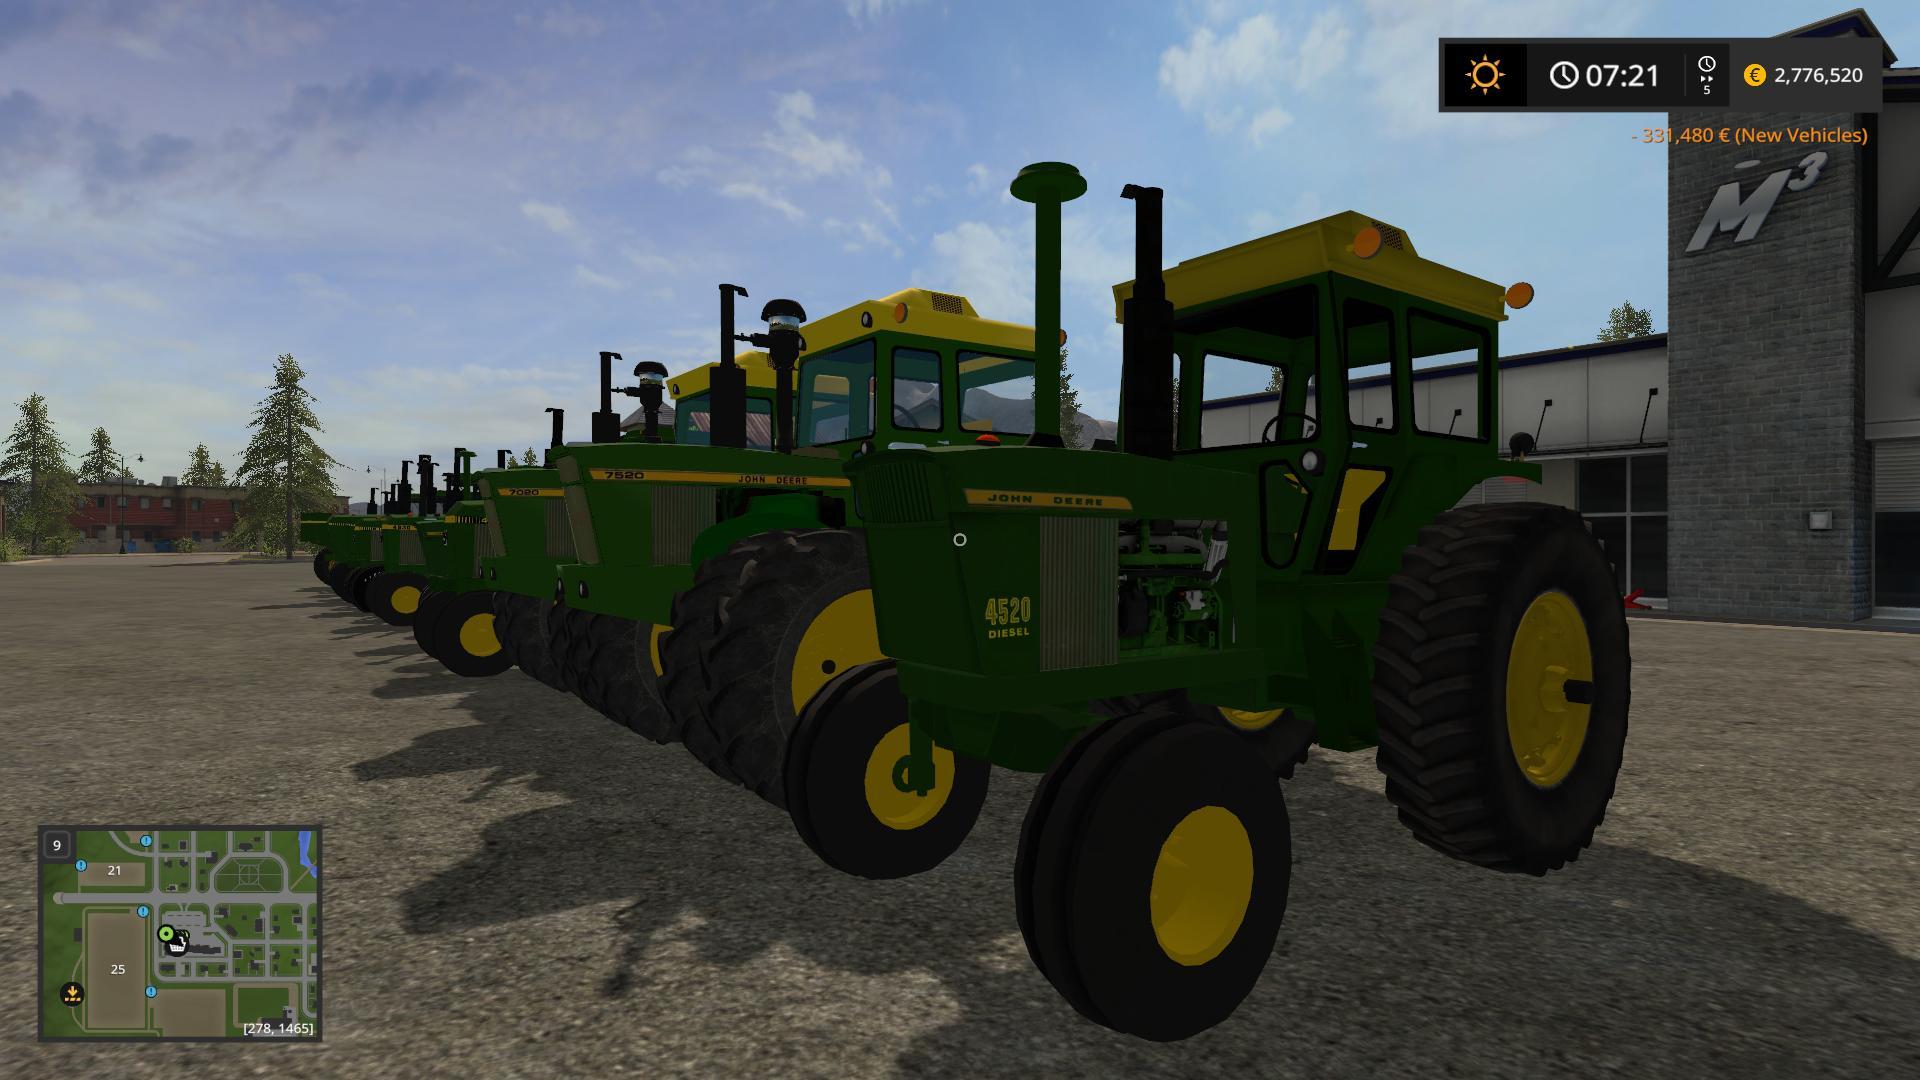 JOHN DEERE OLD SERIES V1 0 0 FS17 - Farming Simulator 17 mod / FS